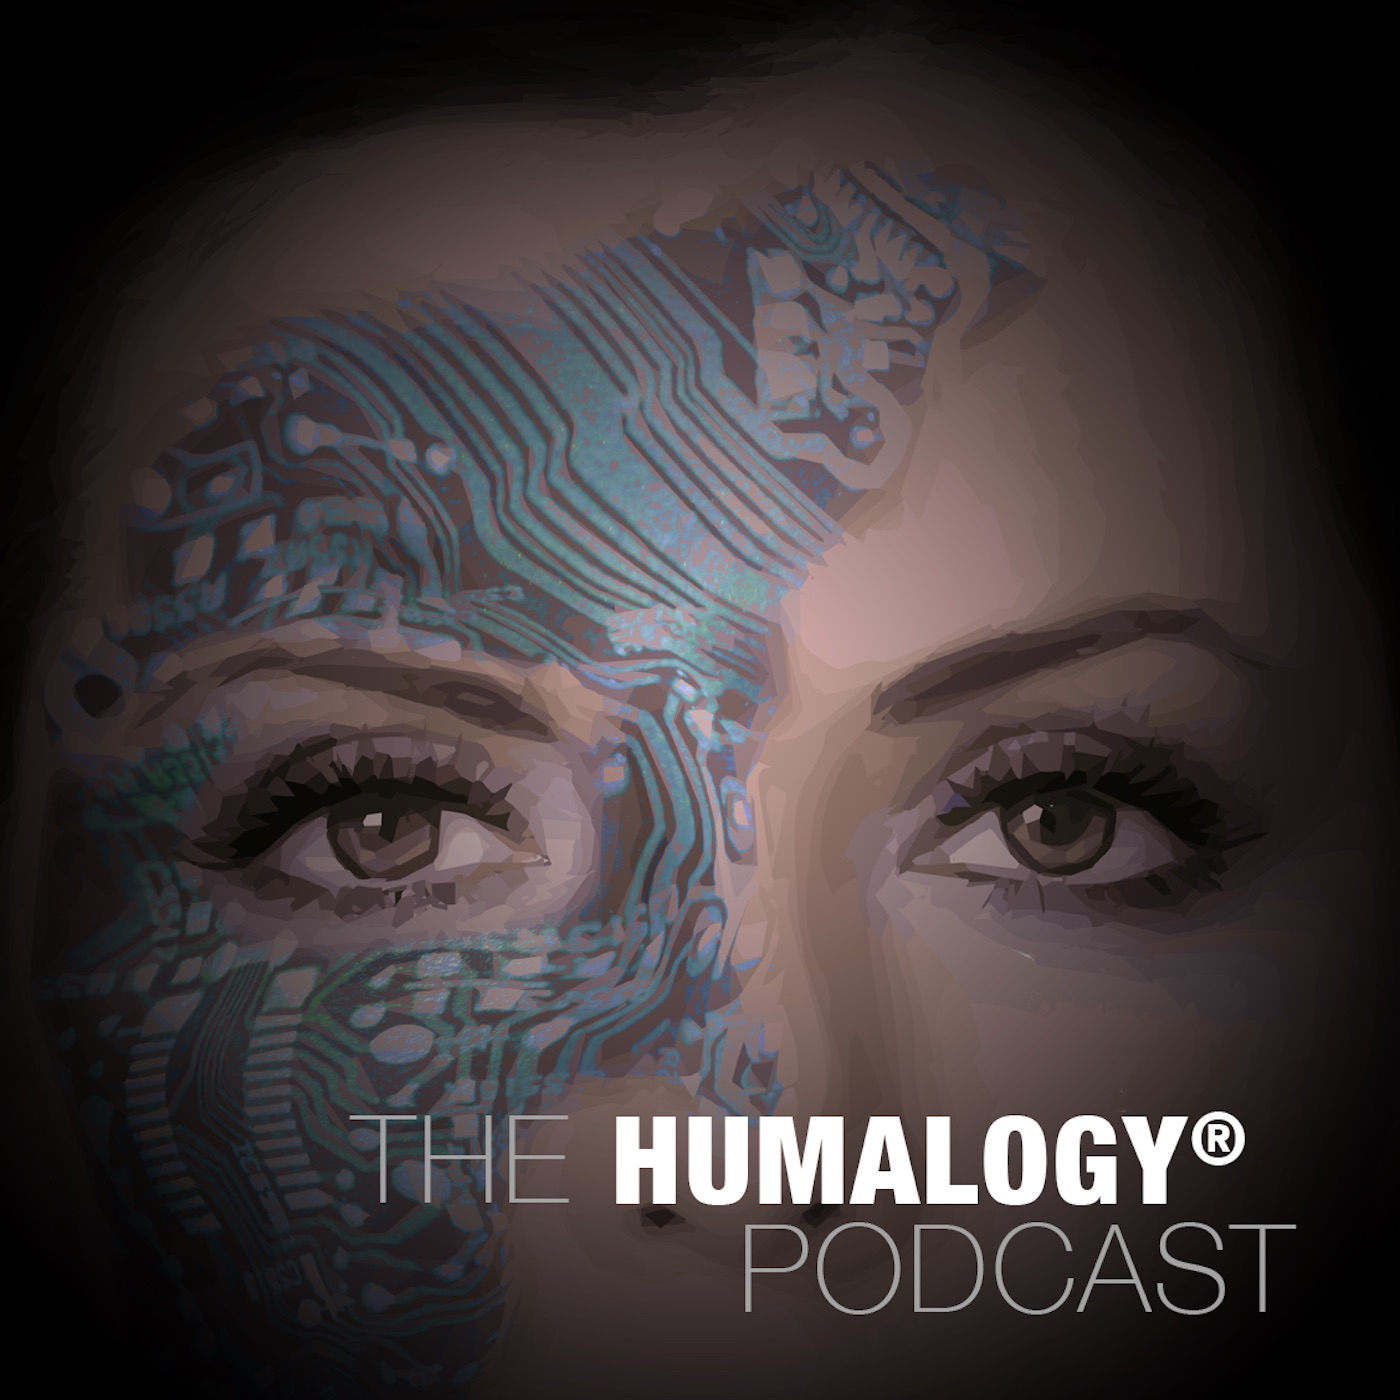 Humalogy_Podcast_No_branding_1400.jpg